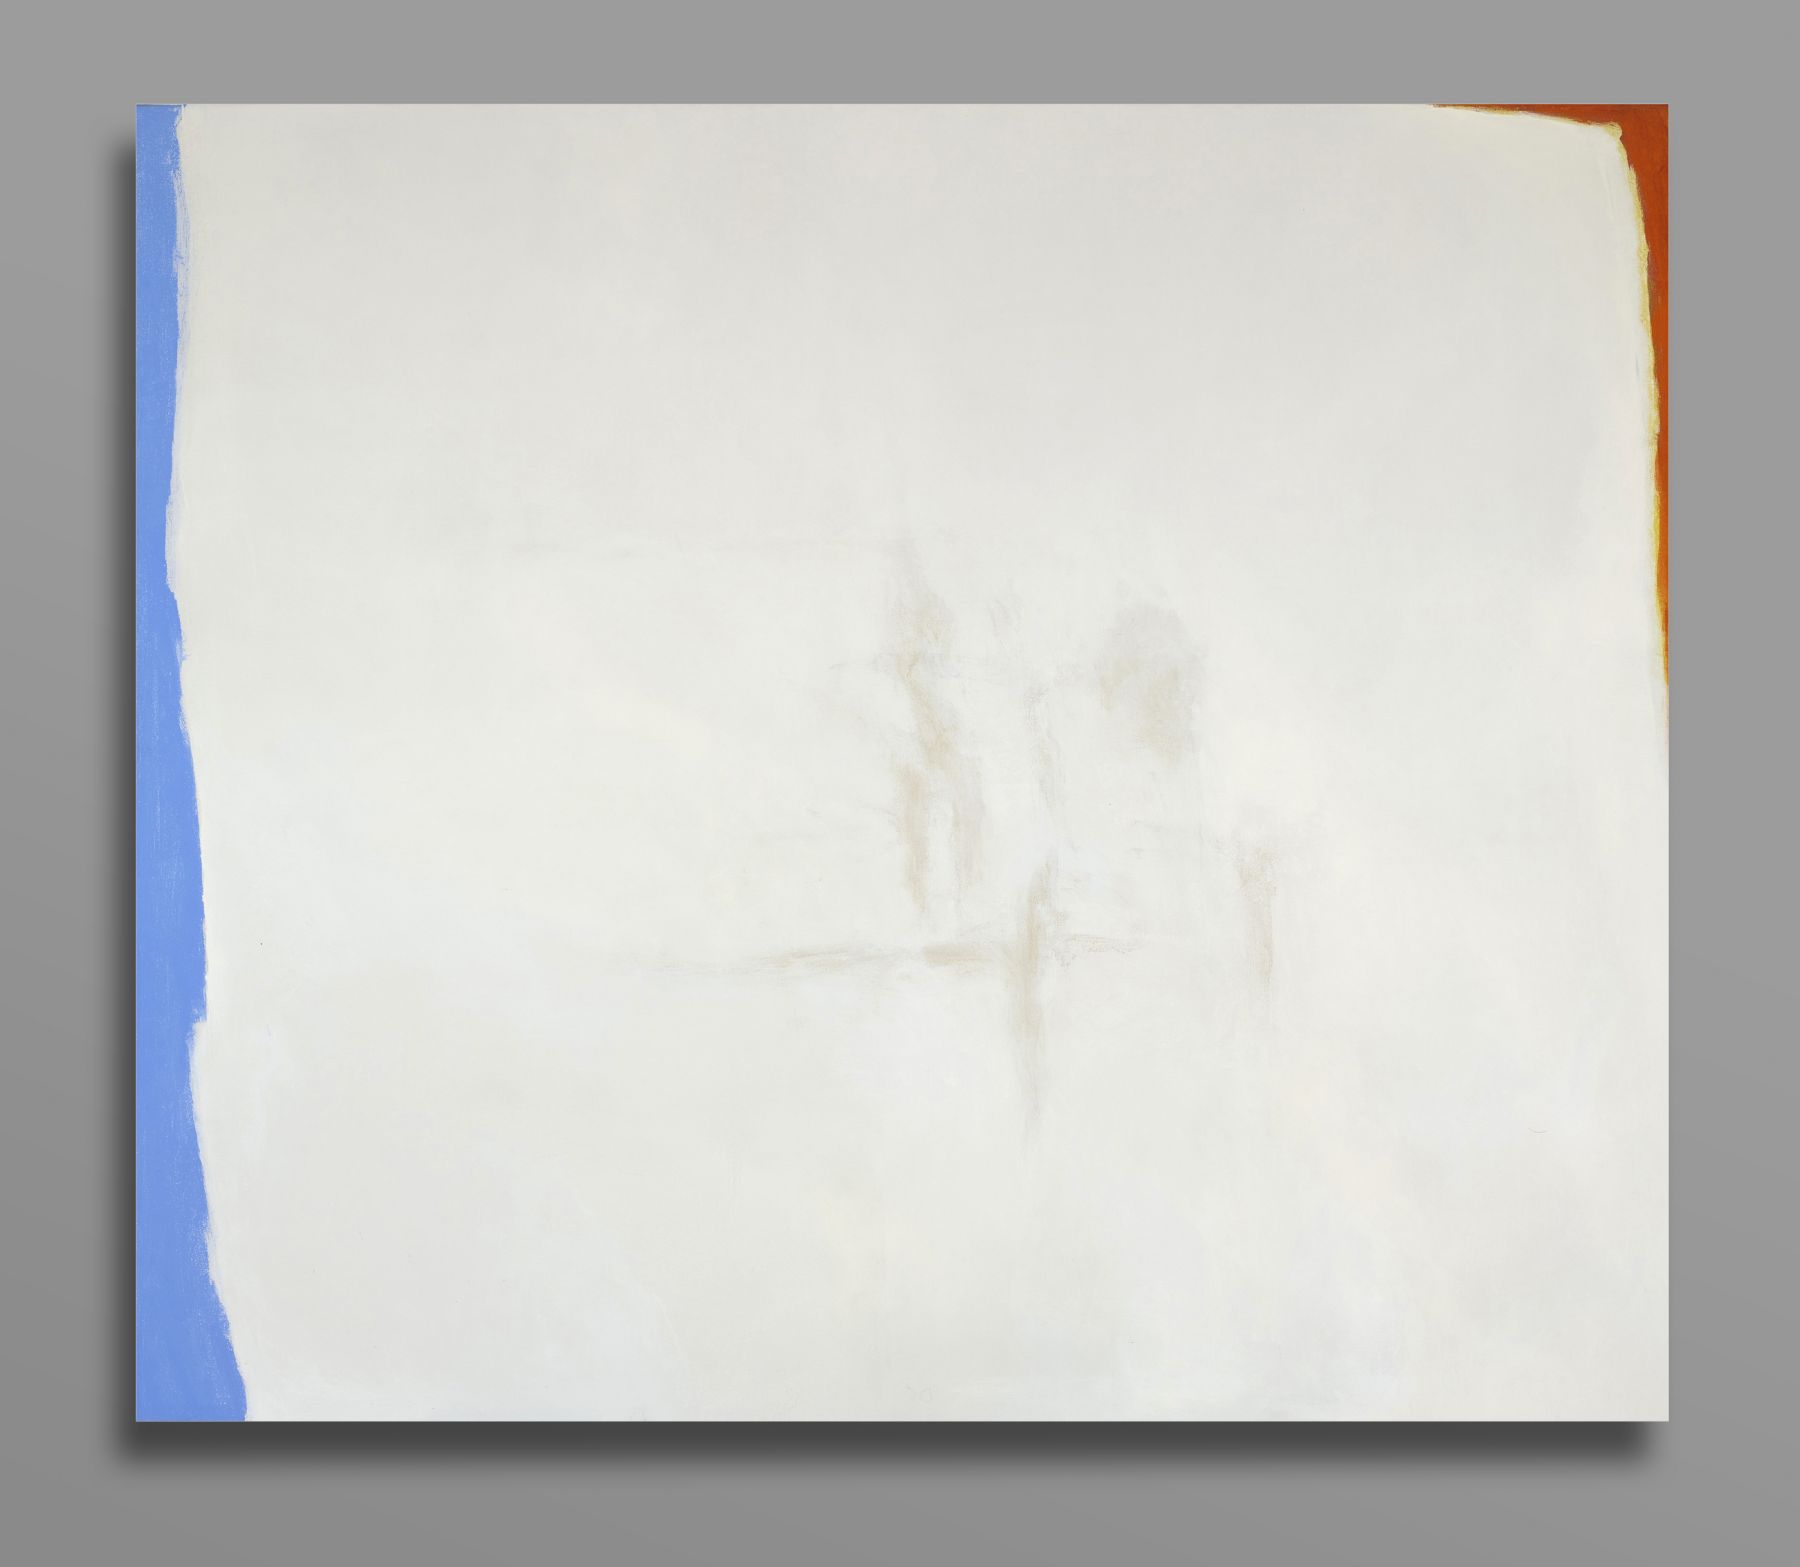 Theodoros Stamos (1922-1997), Grand White Sun-Box, 1964-1965